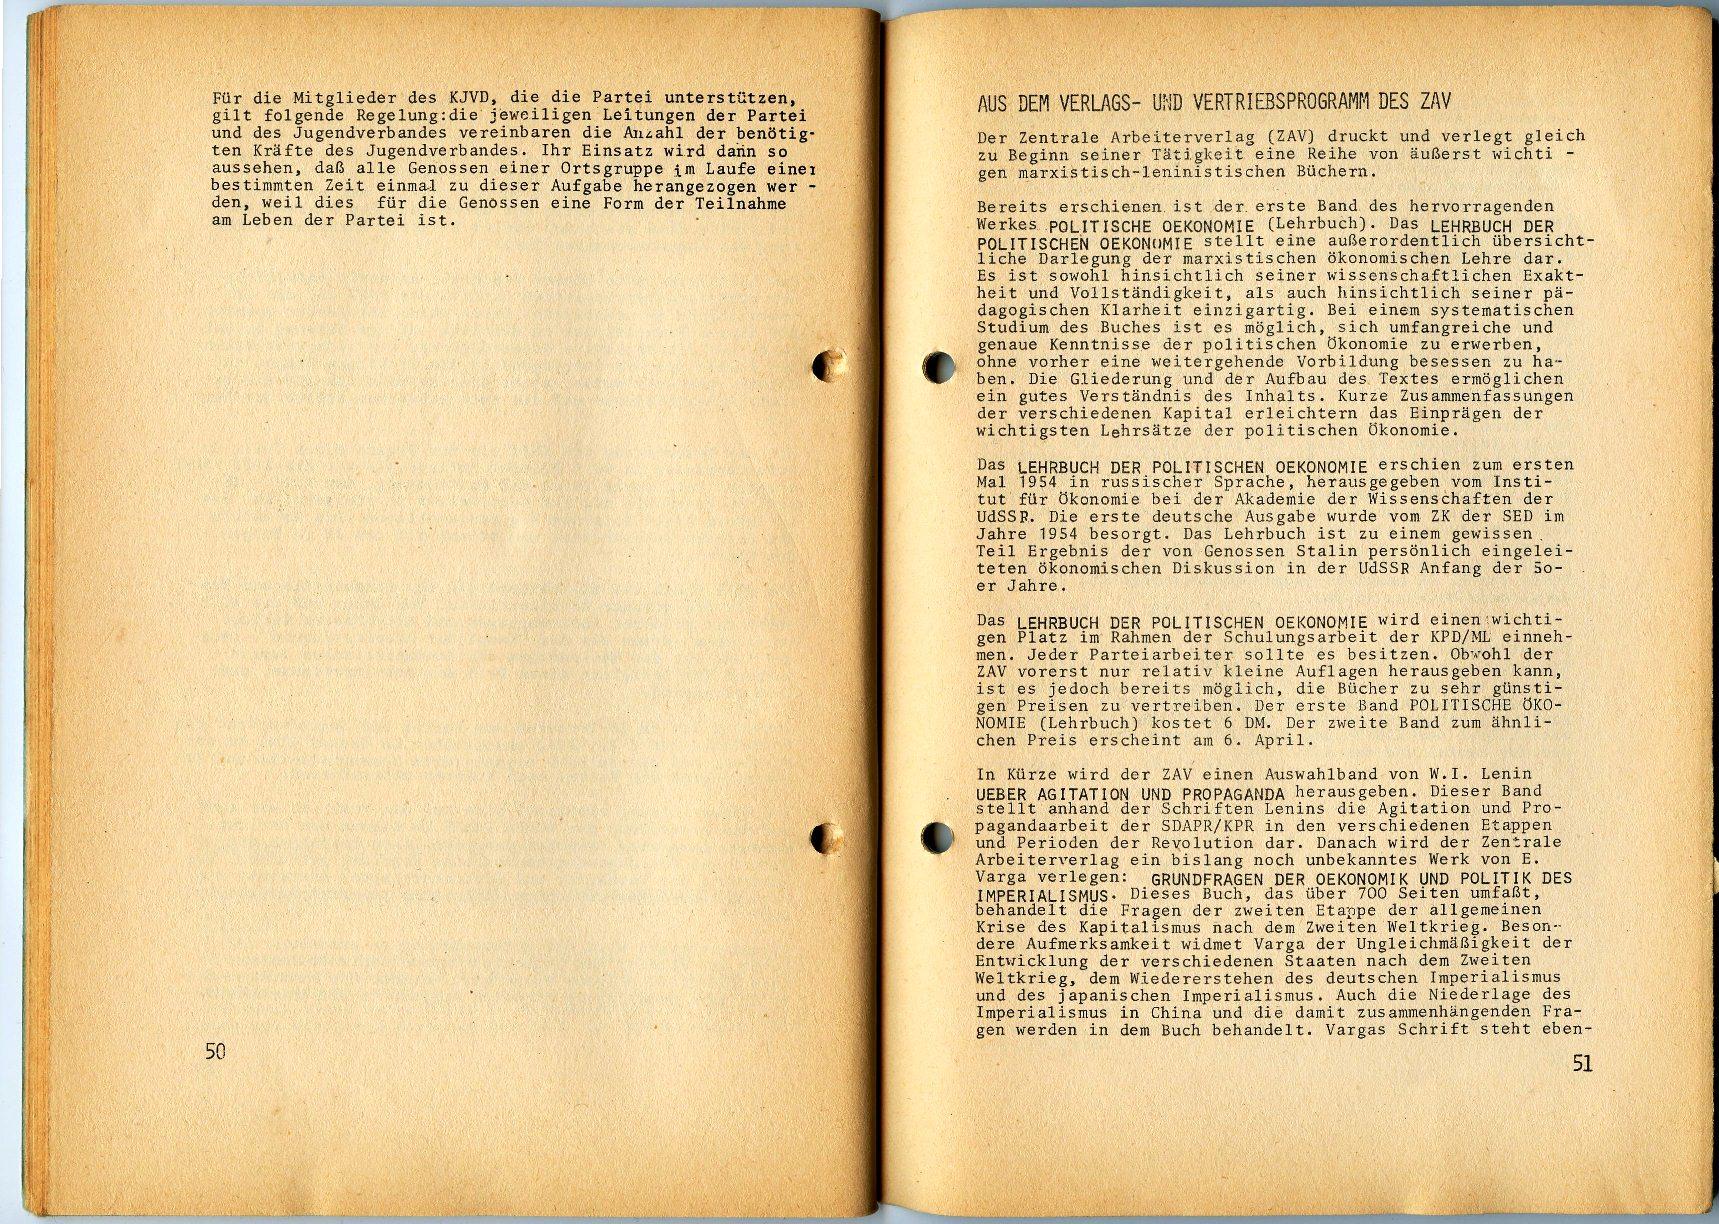 ZB_Parteiarbeiter_1971_04_26